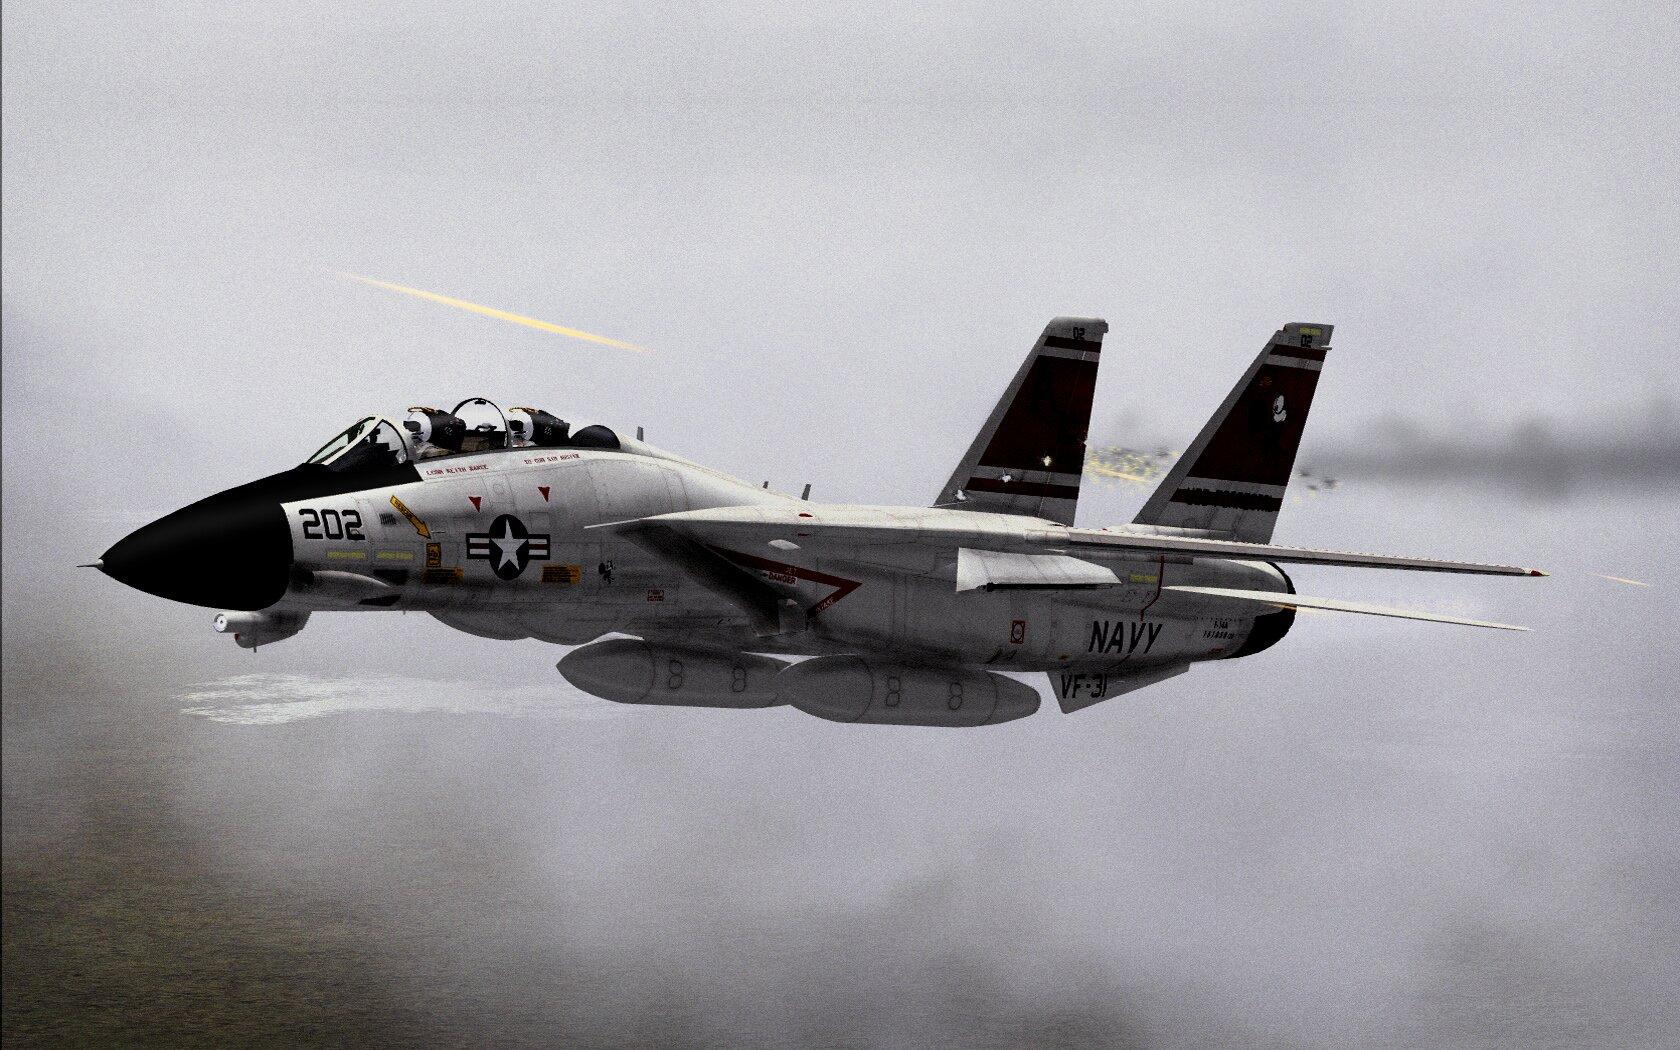 F 14 Super Tomcat F14_Tomcat_gets_shot_b...